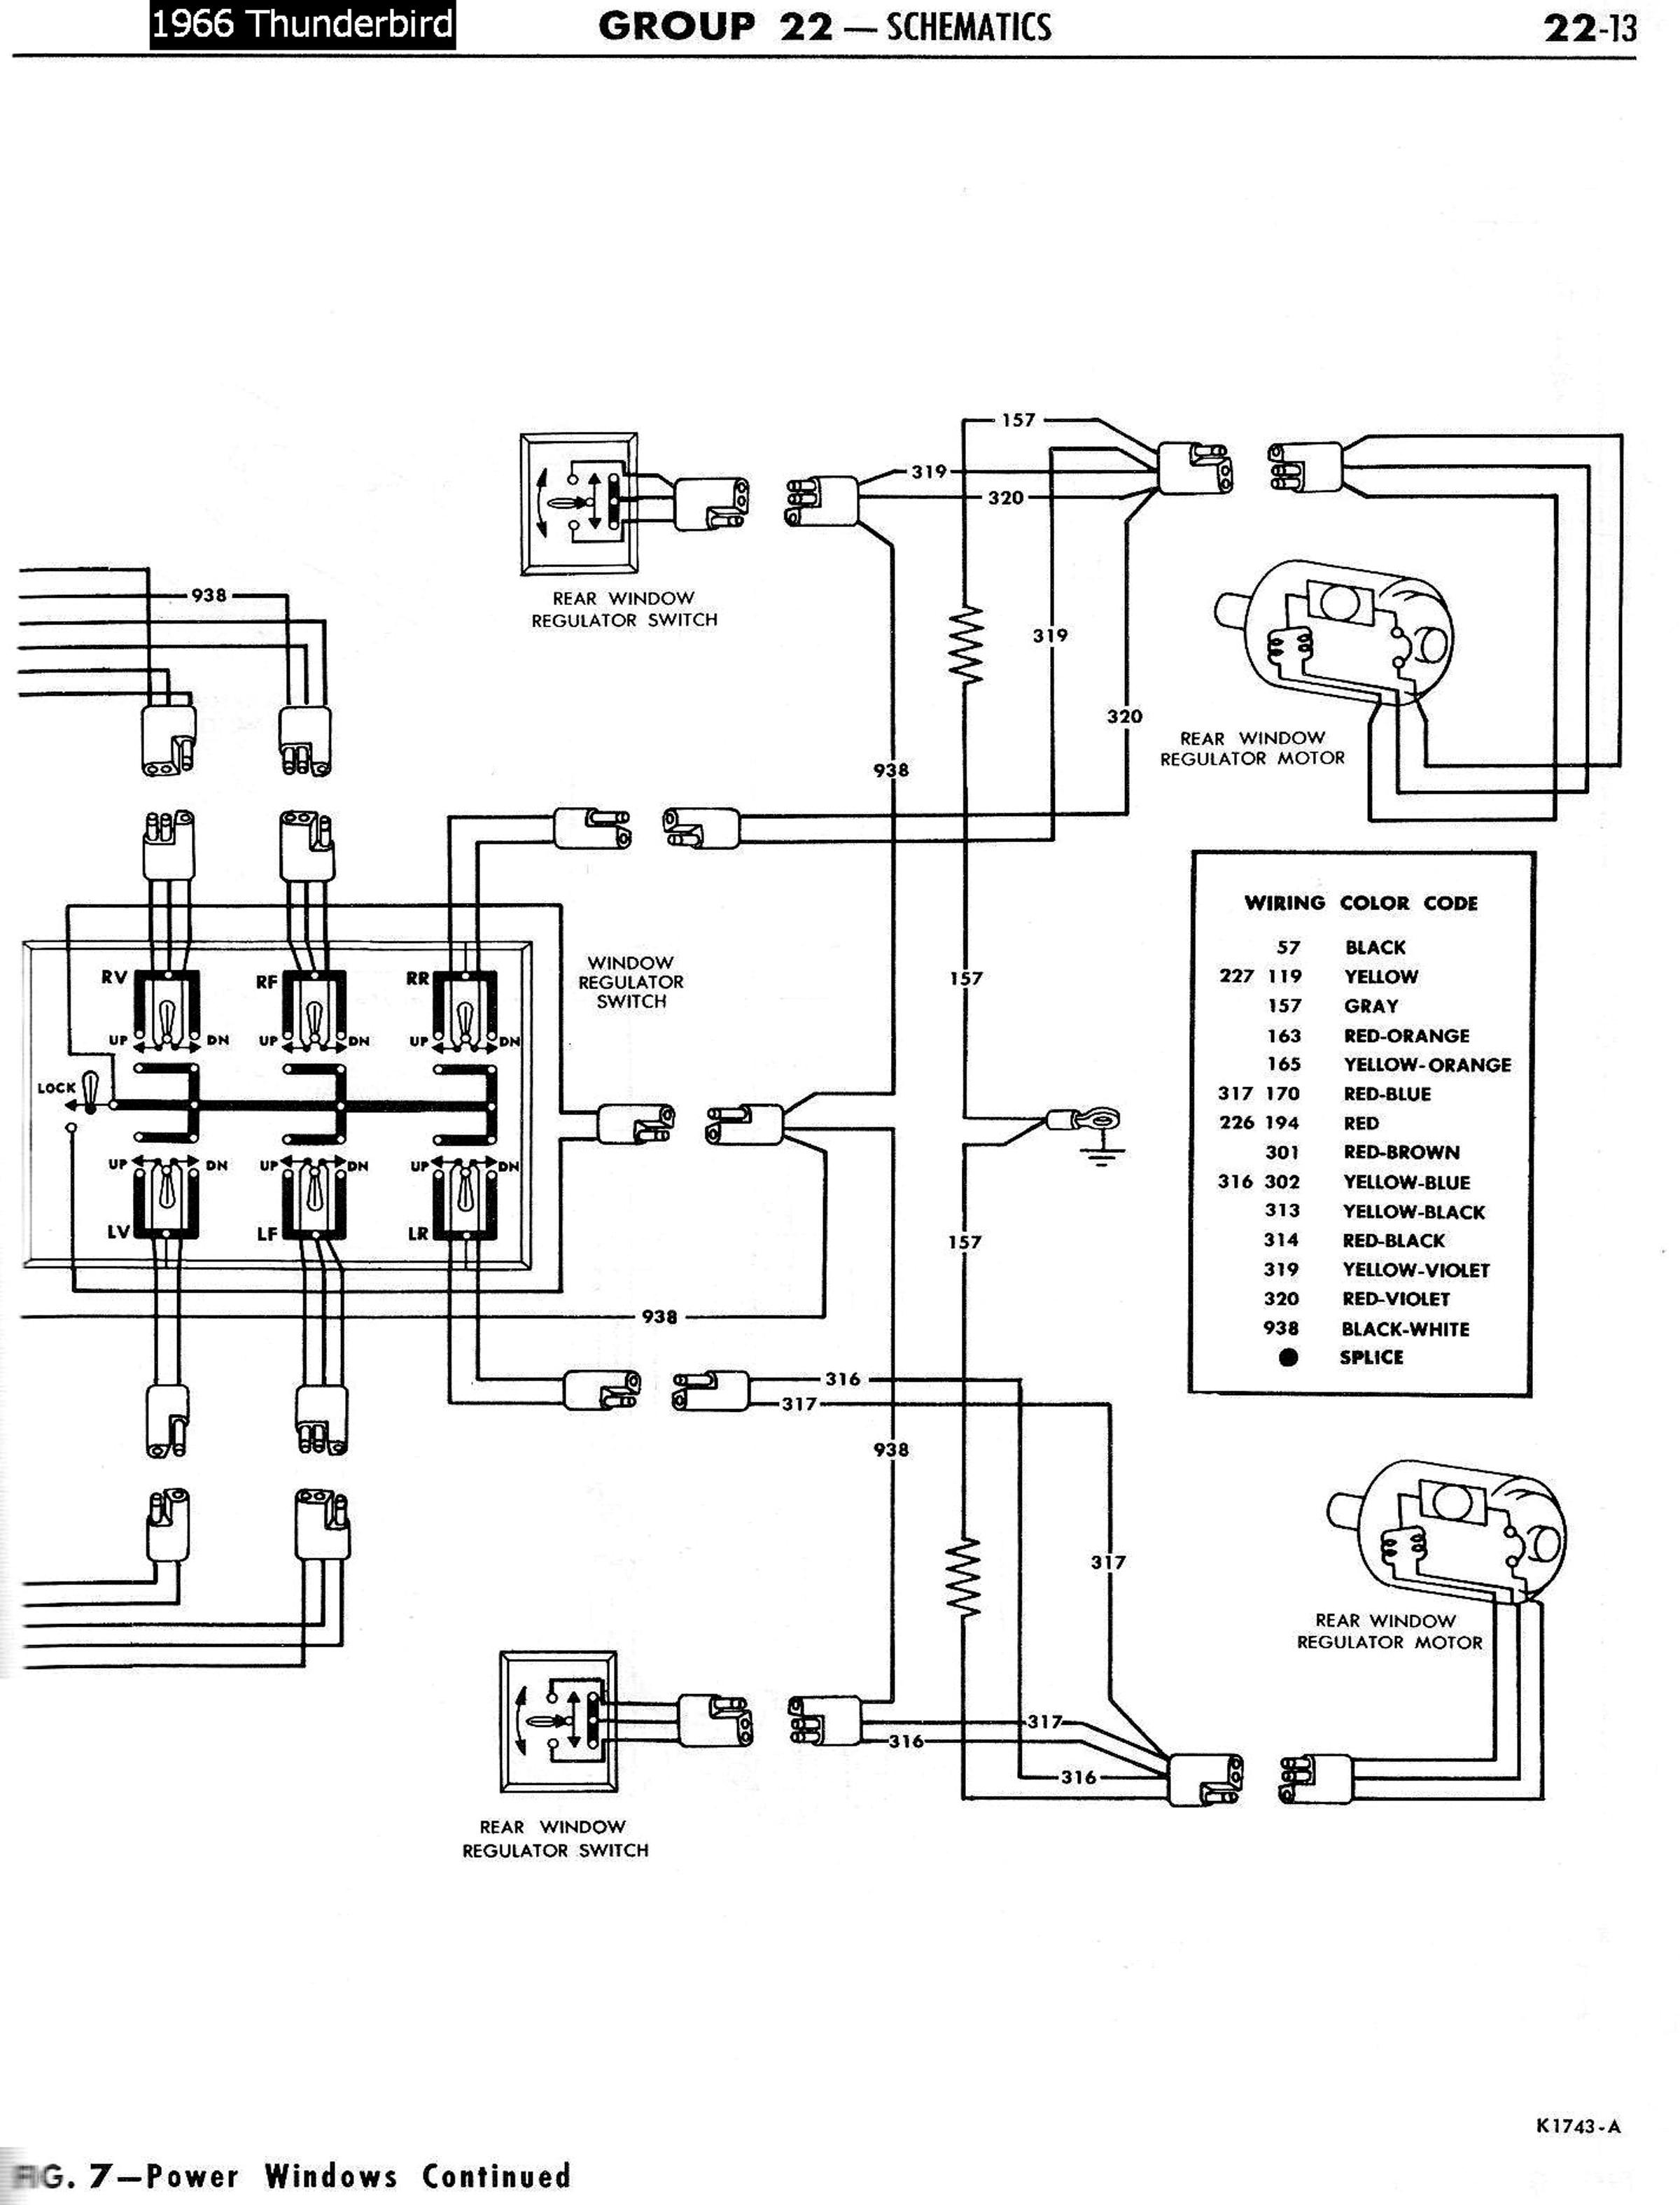 Flasher Relay Diagram 1965 T Bird Wiring Diagram Turn Signals Wiring Diagram Of Flasher Relay Diagram